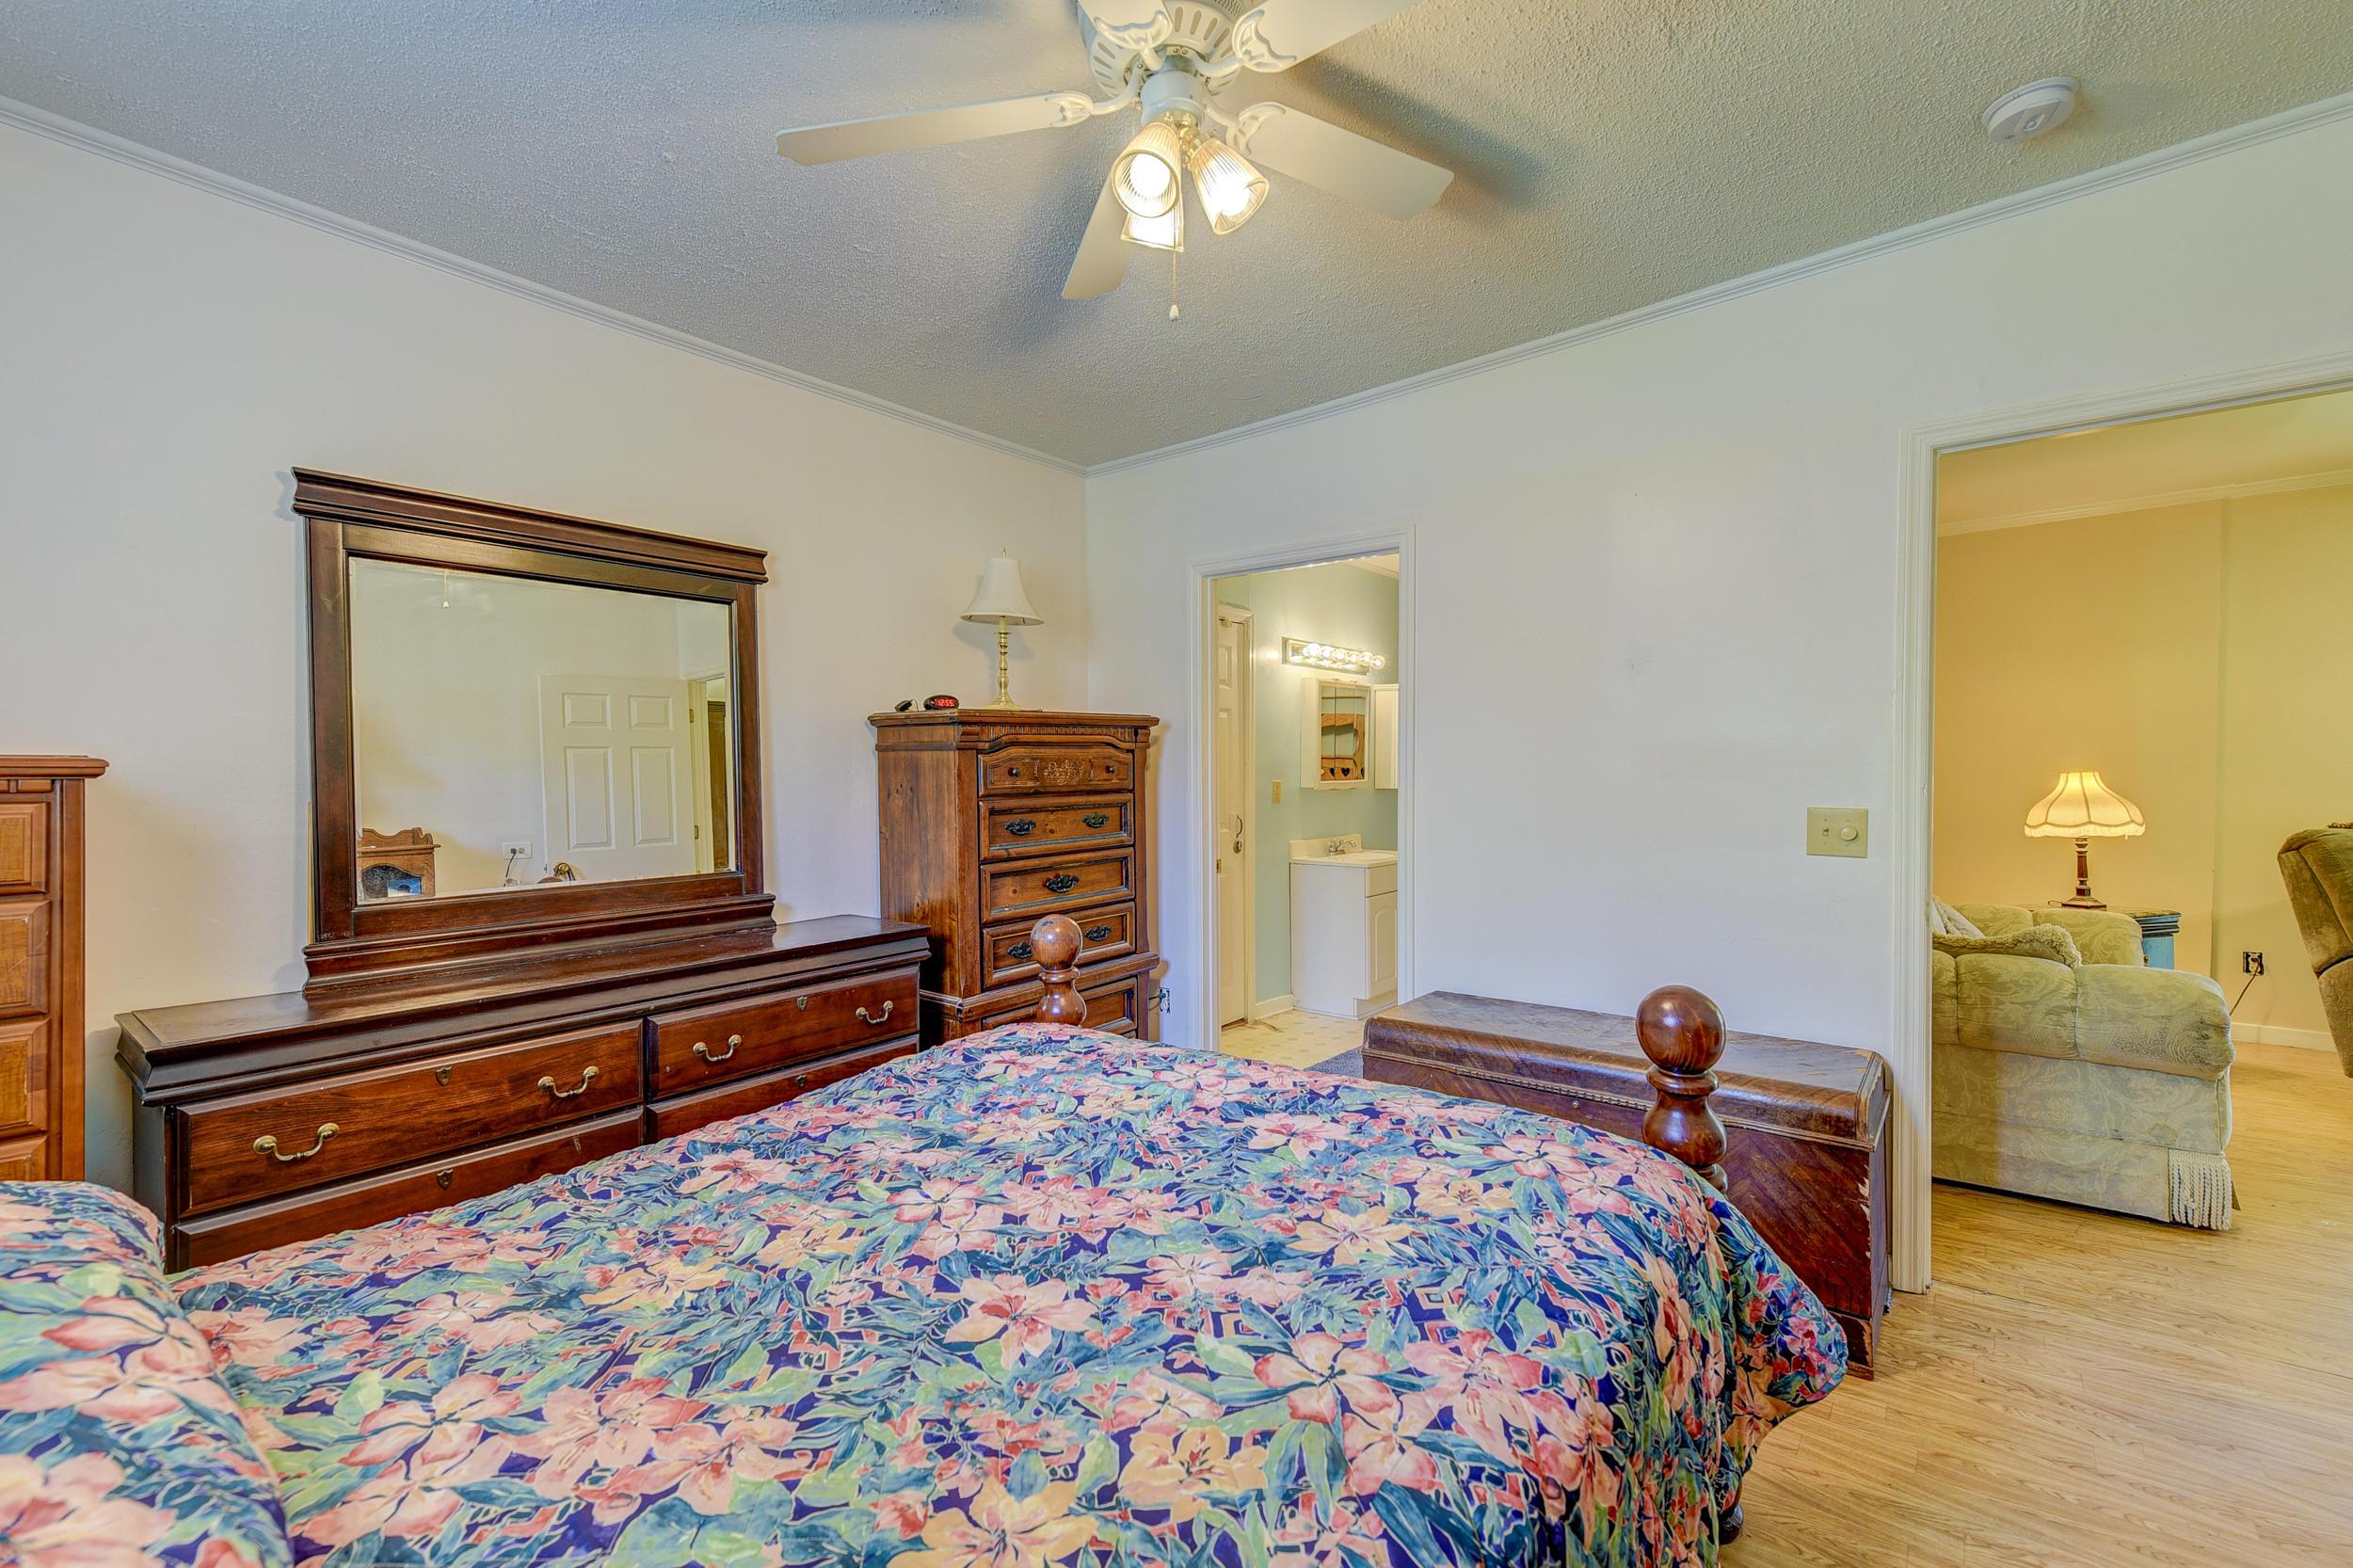 St Andrews Homes For Sale - 1908 2nd, Charleston, SC - 7